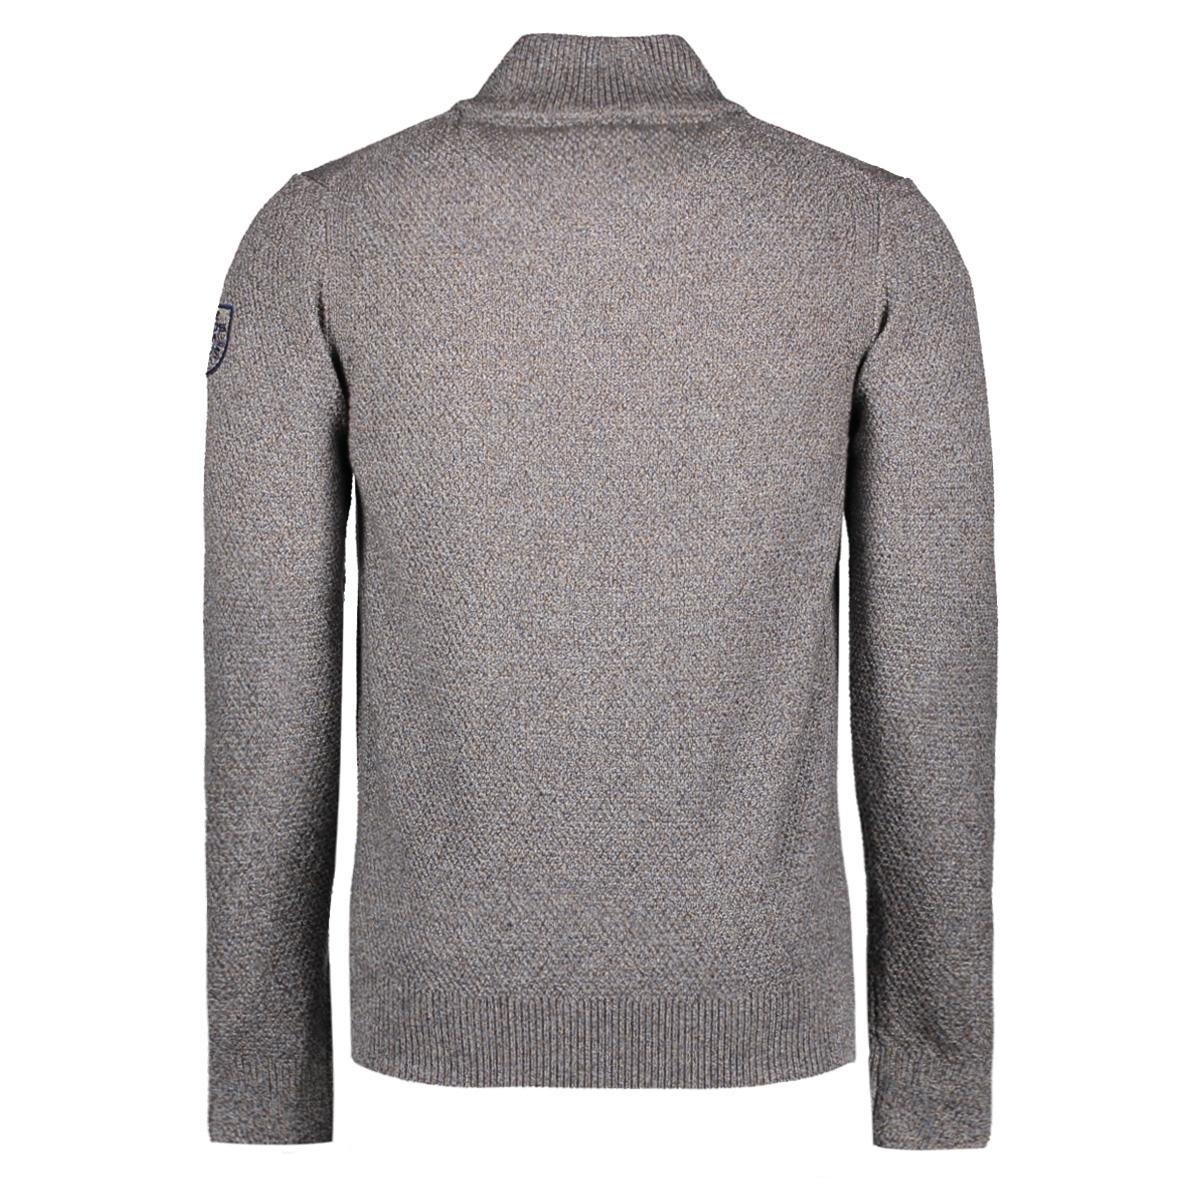 161-37018 bluefields vest 5984